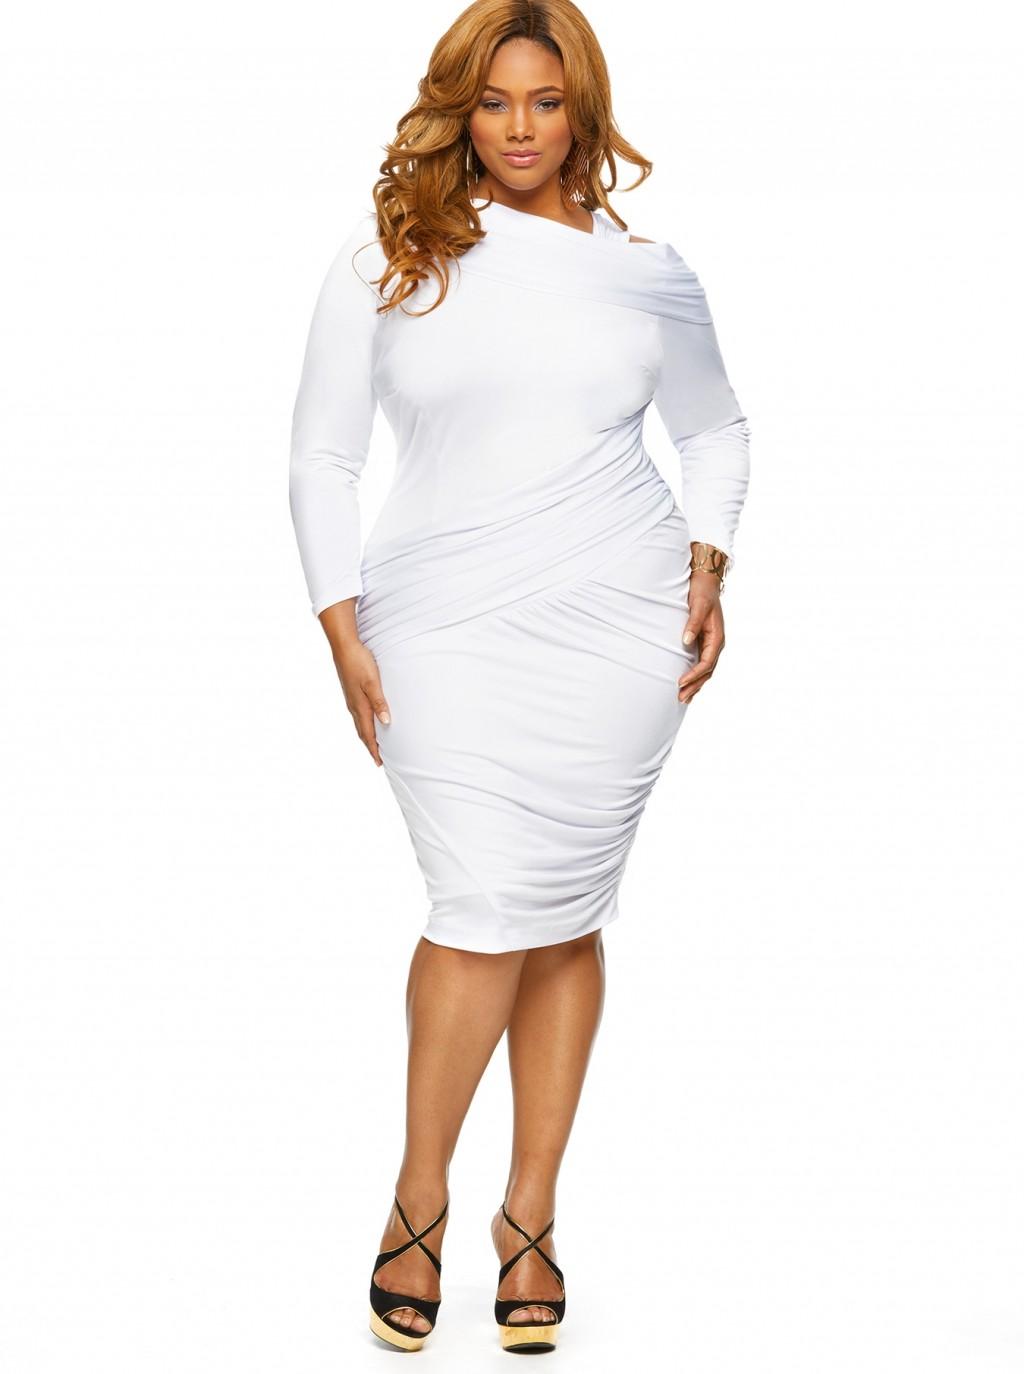 white plus size dress suits style jeans. Black Bedroom Furniture Sets. Home Design Ideas